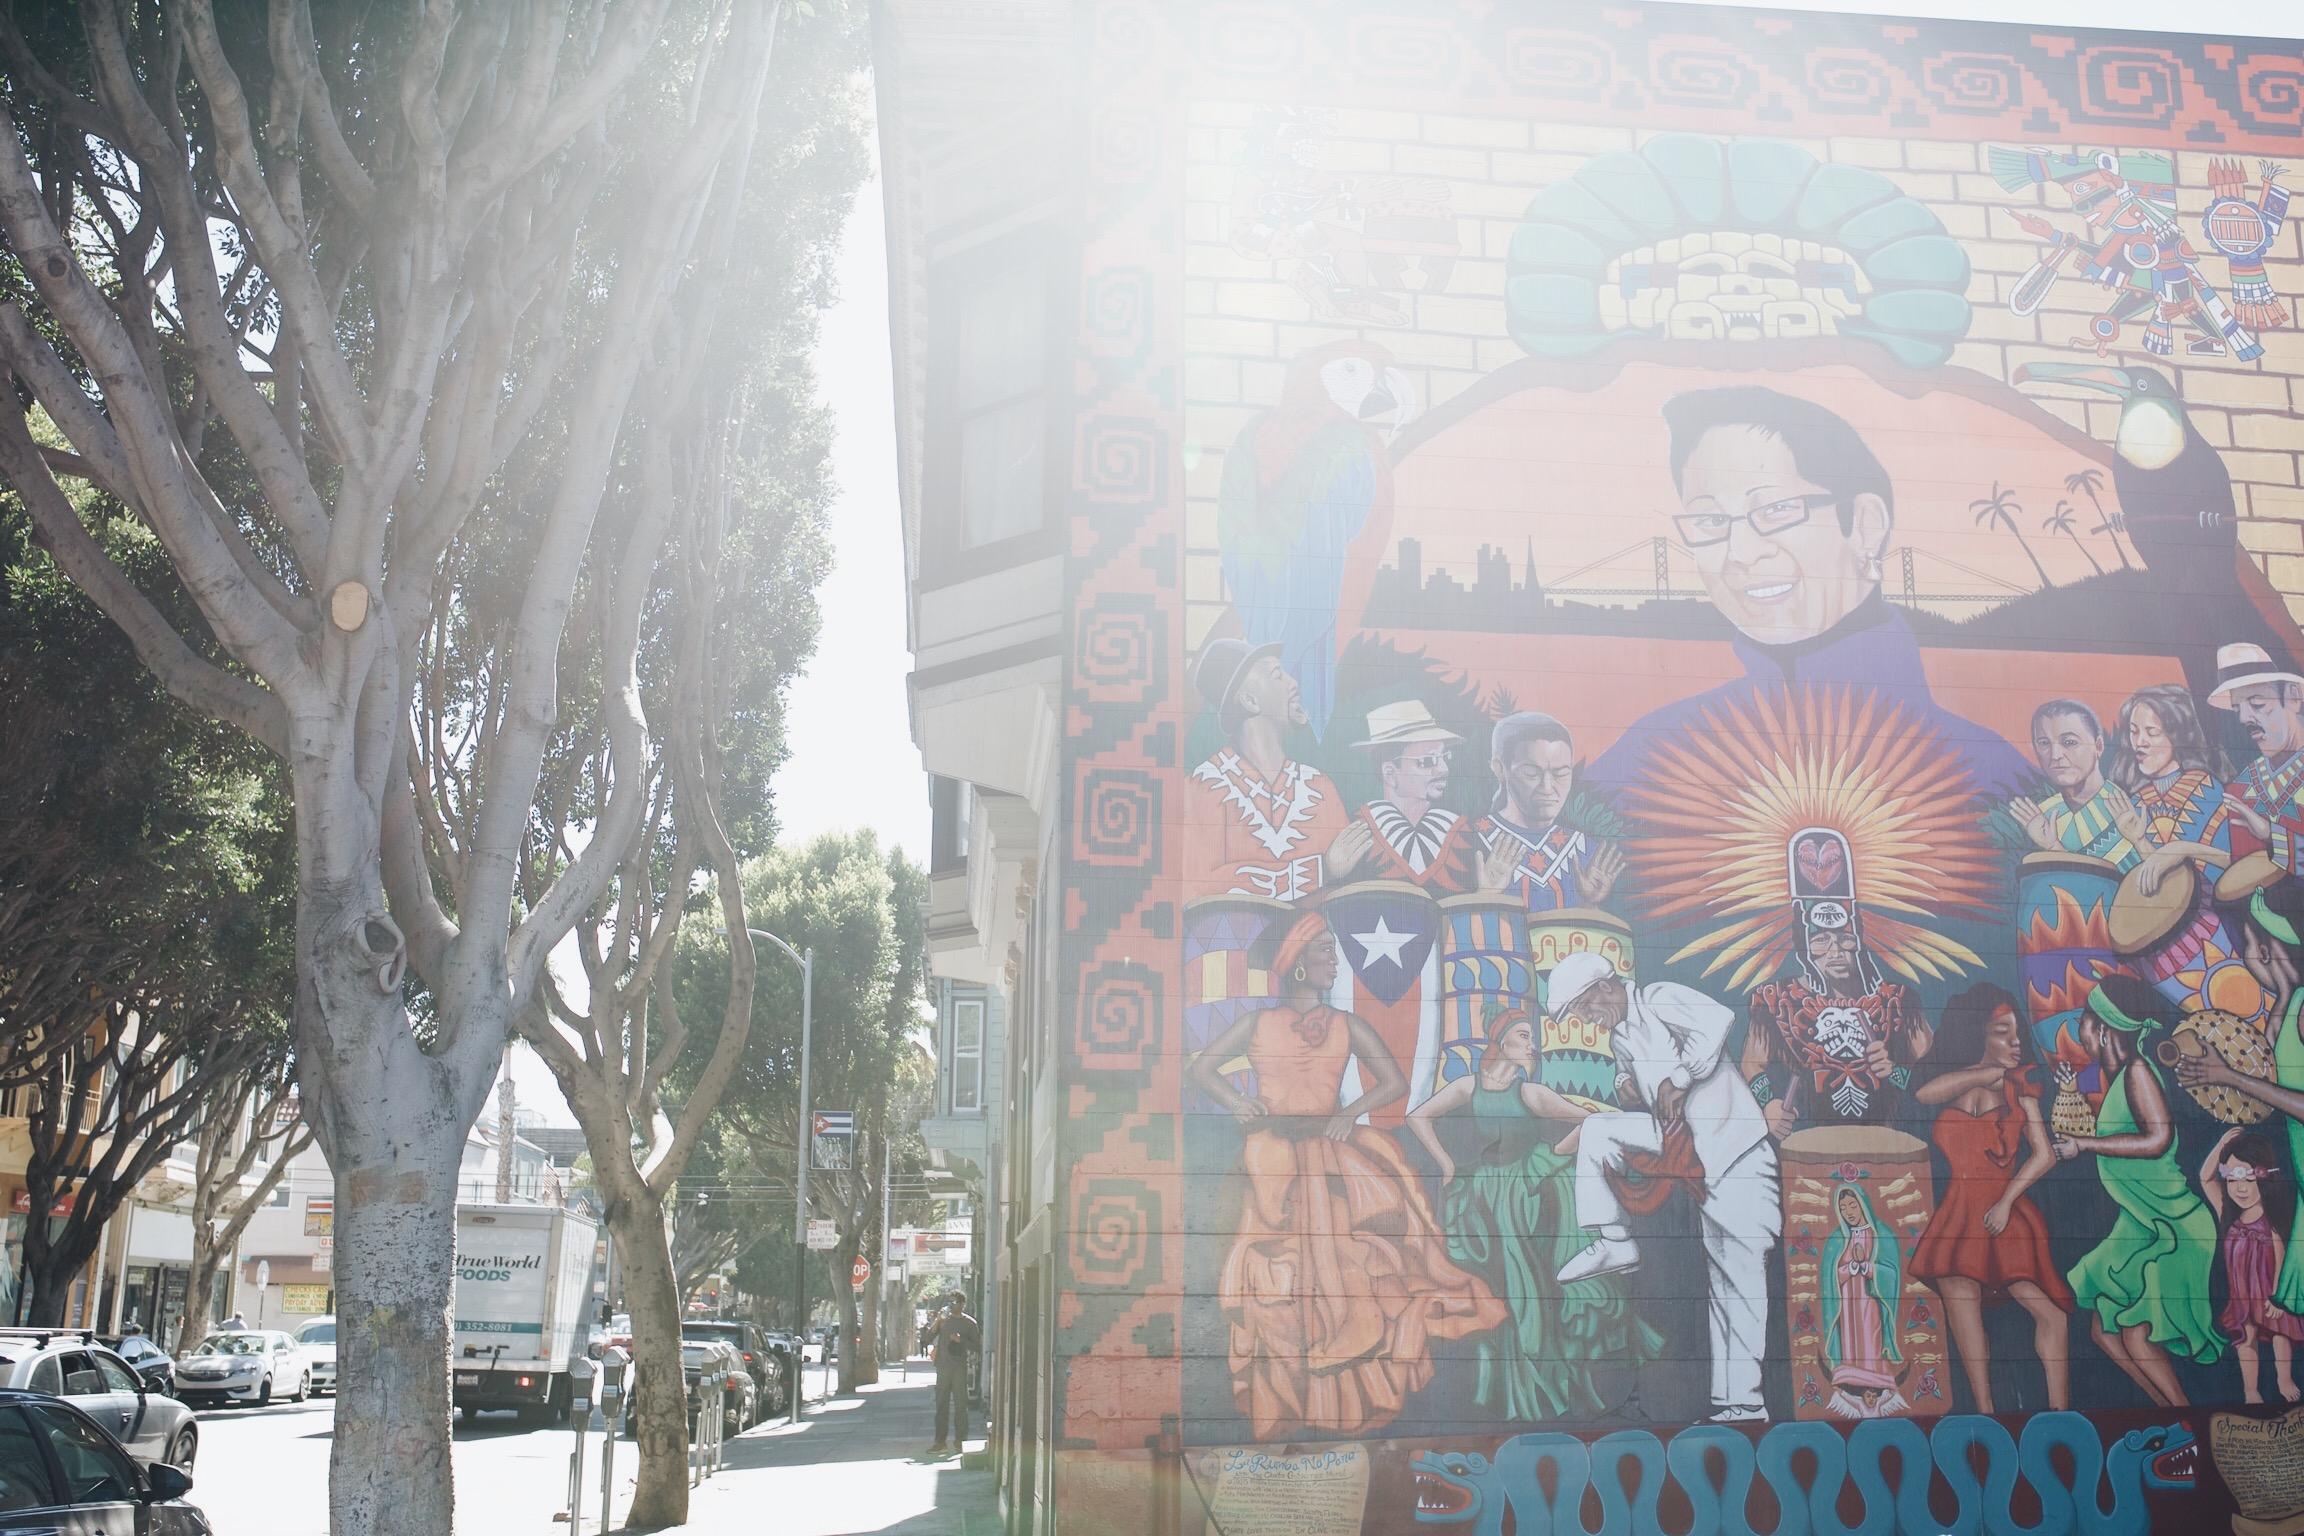 fresques-murales-sreet-art-san-francisco.JPG